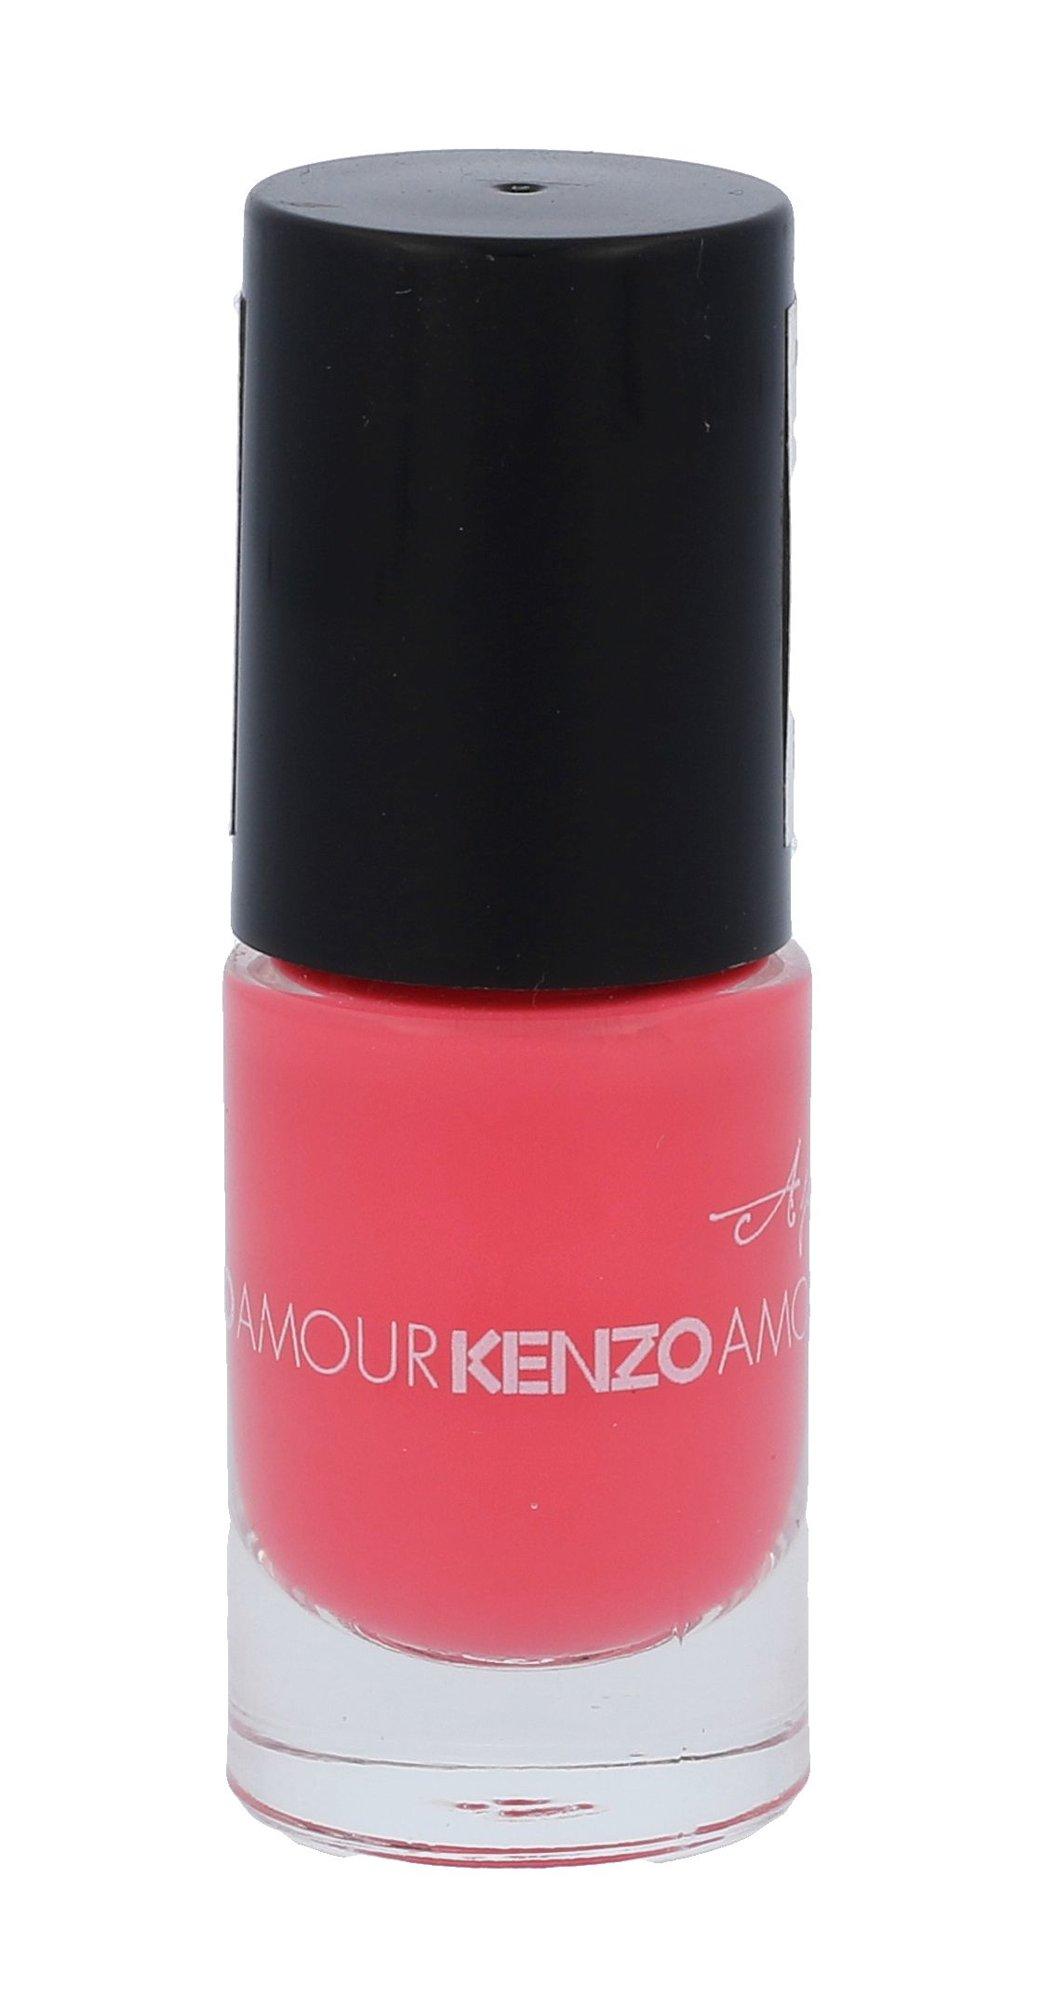 KENZO Kenzo Amour Cosmetic 5ml Hibiscus Coral